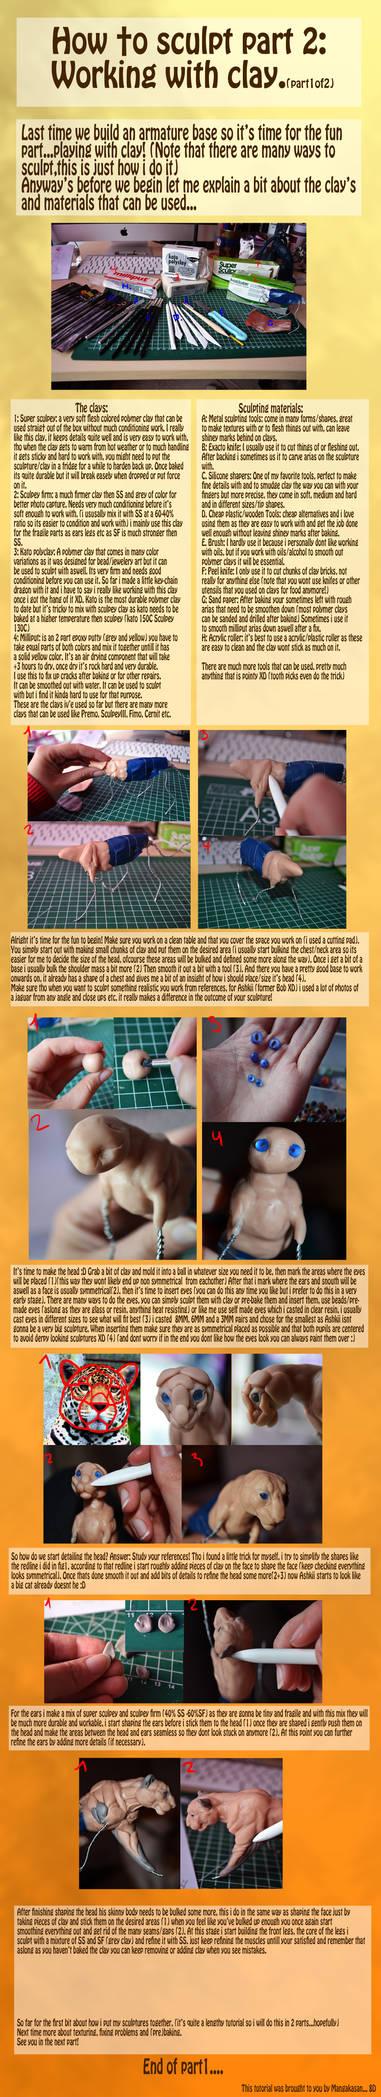 Sculpting tut part 2 1 of 2. reupload